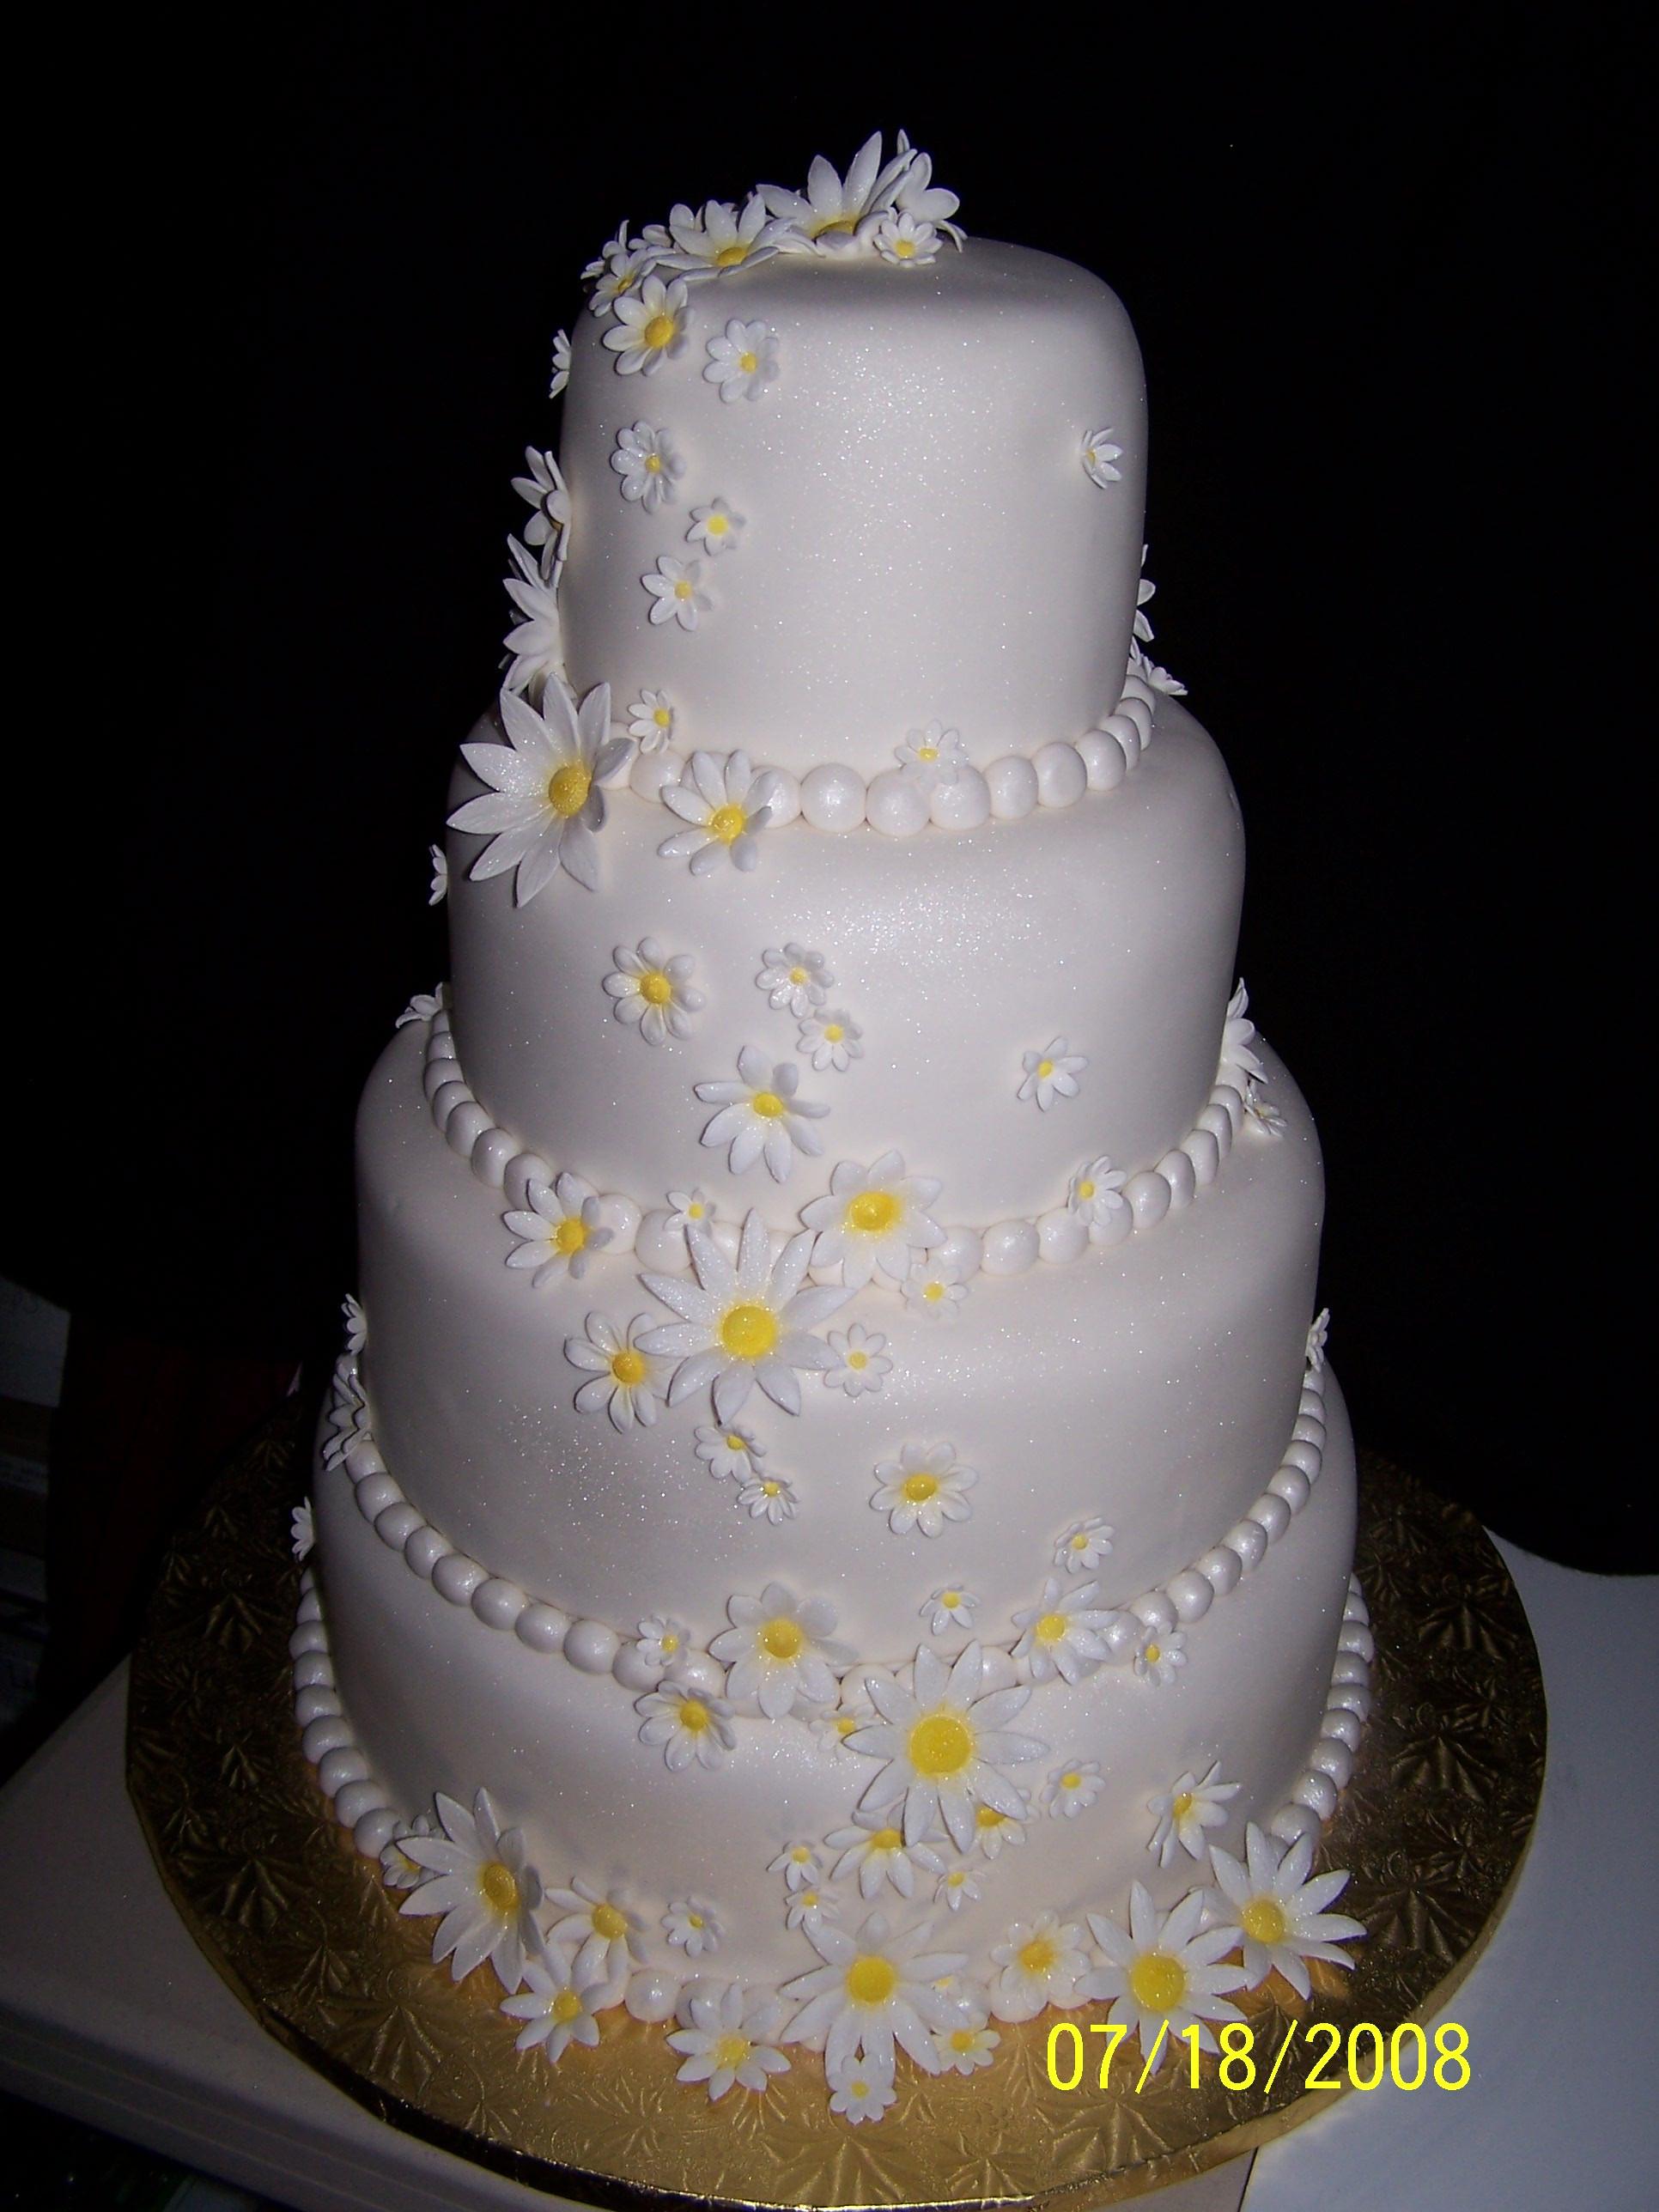 Daisy Wedding Cakes  Daisy wedding cakes idea in 2017